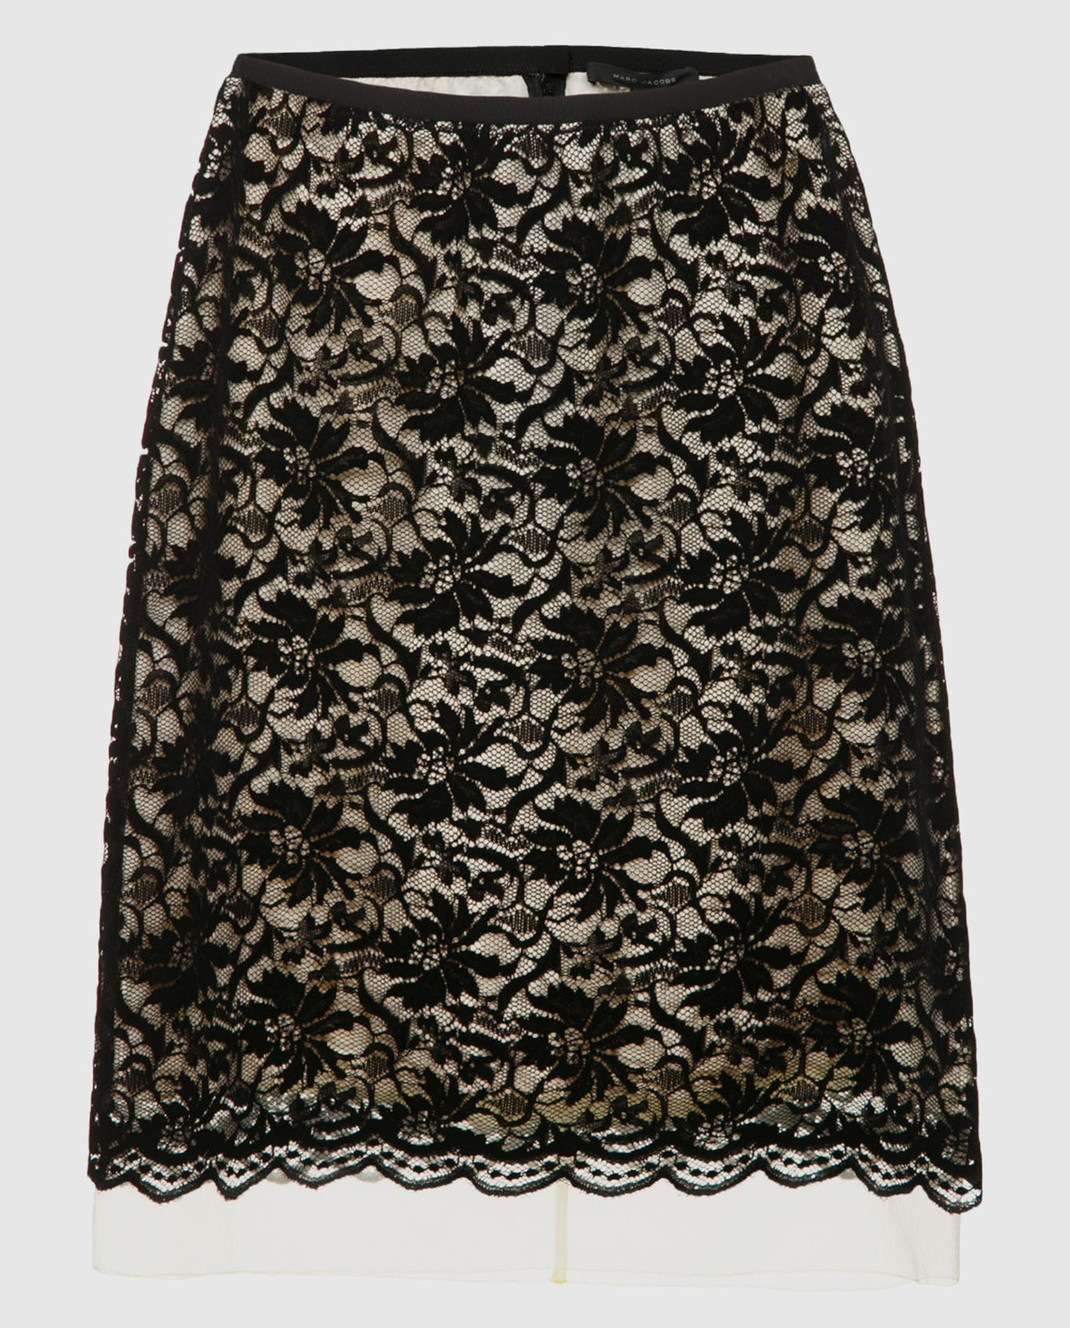 Marc Jacobs Золотистая юбка из кружева M4007156